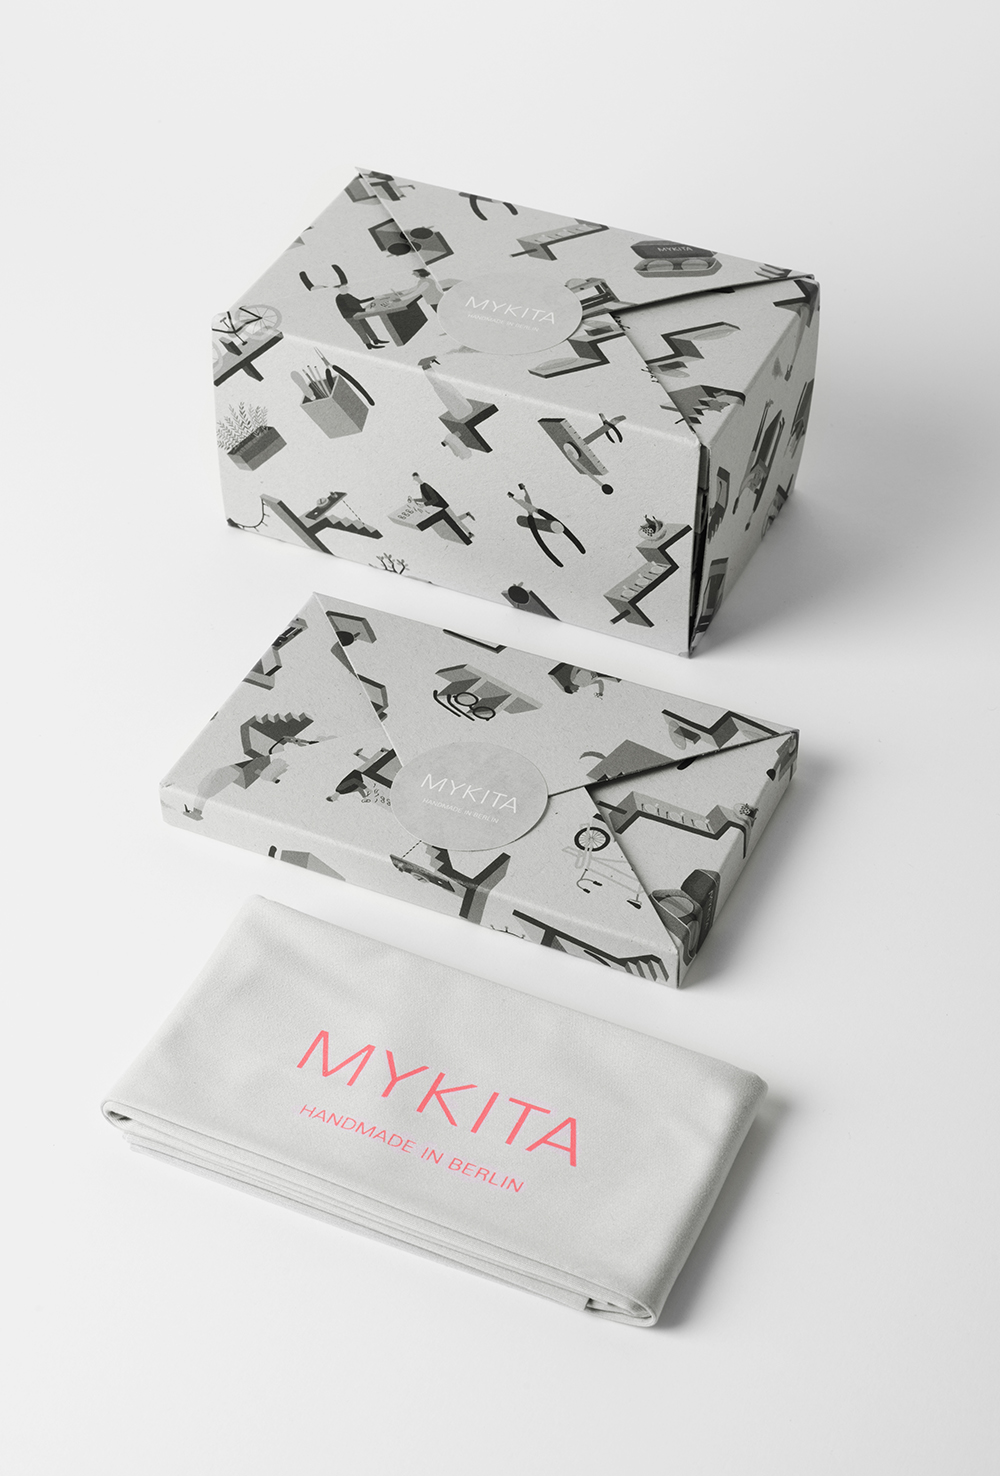 HvassHannibal_MYKITA_Presents_PUTZTUCH_Box_Verpackung_Tuch_Grau.jpg